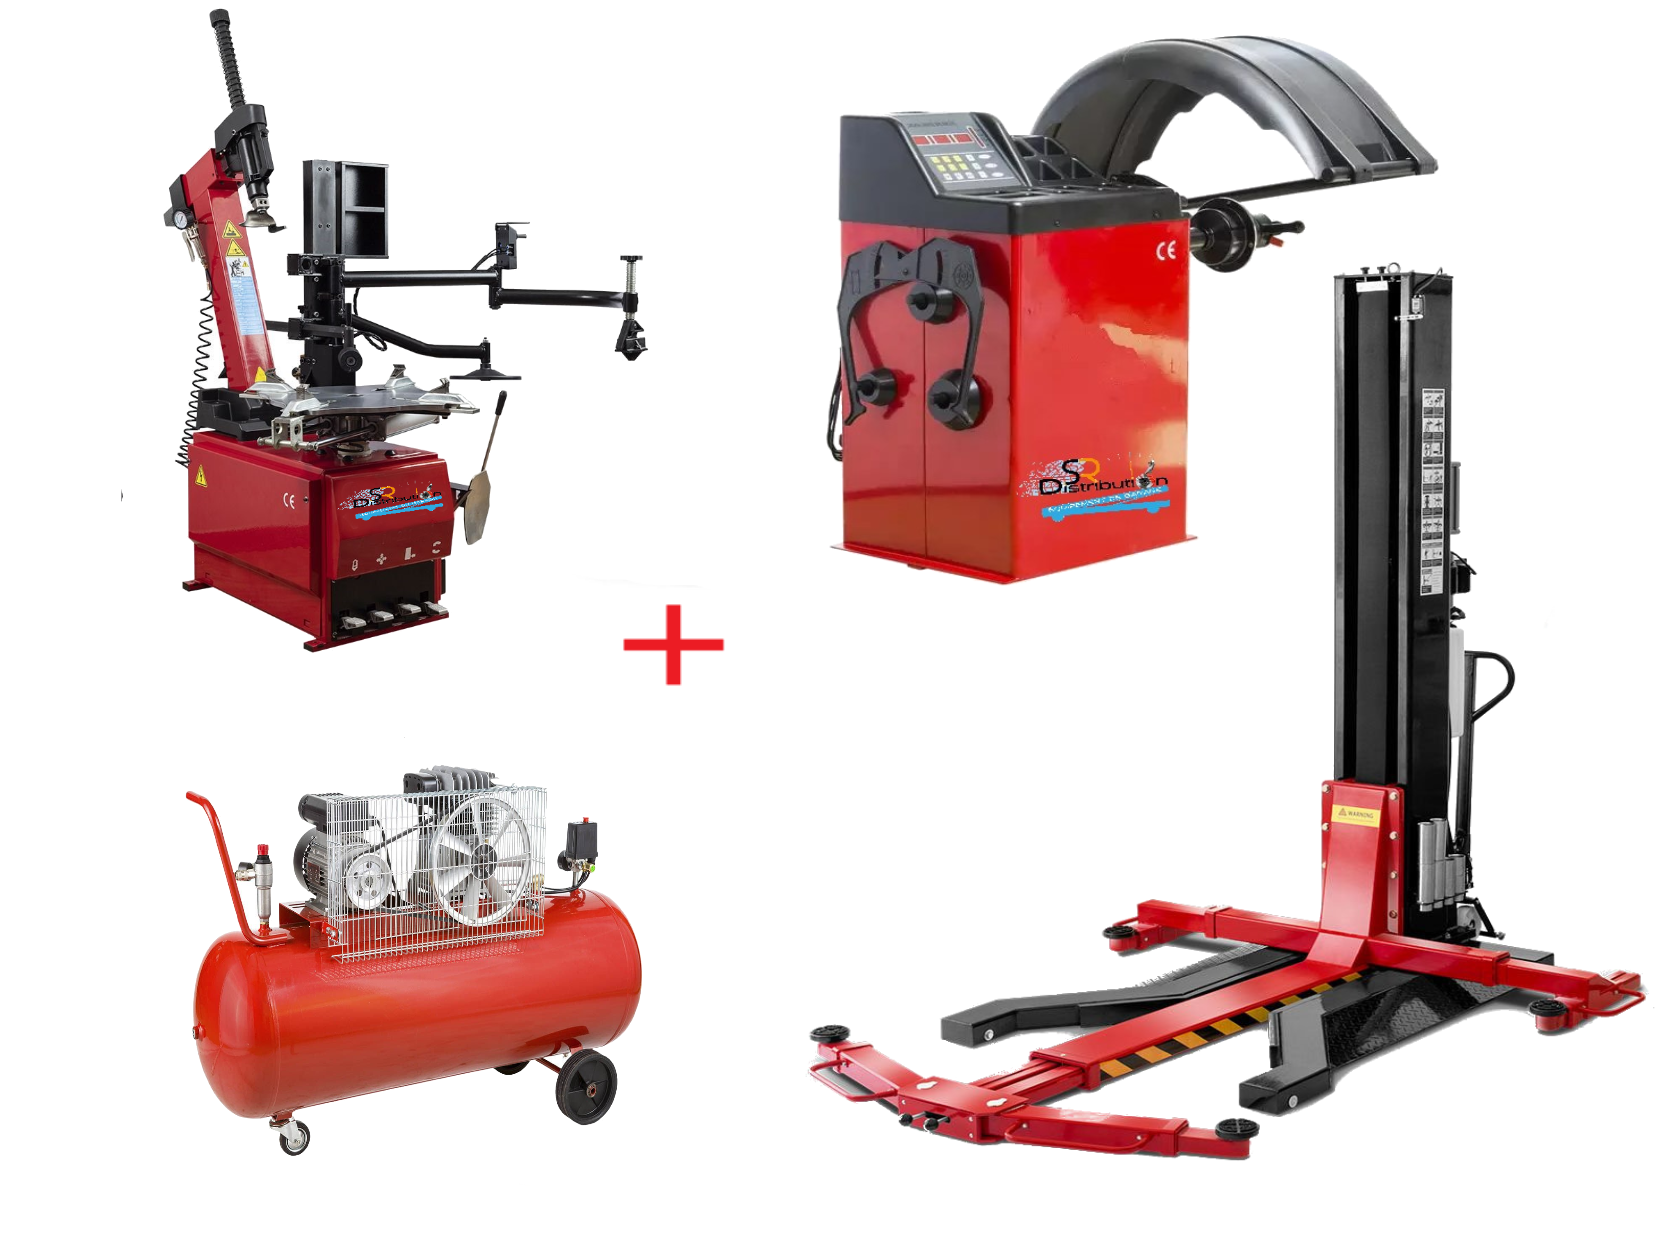 Pack Montage Équilibrage Runflat + Compresseur + Pont Mobile 220 Volts